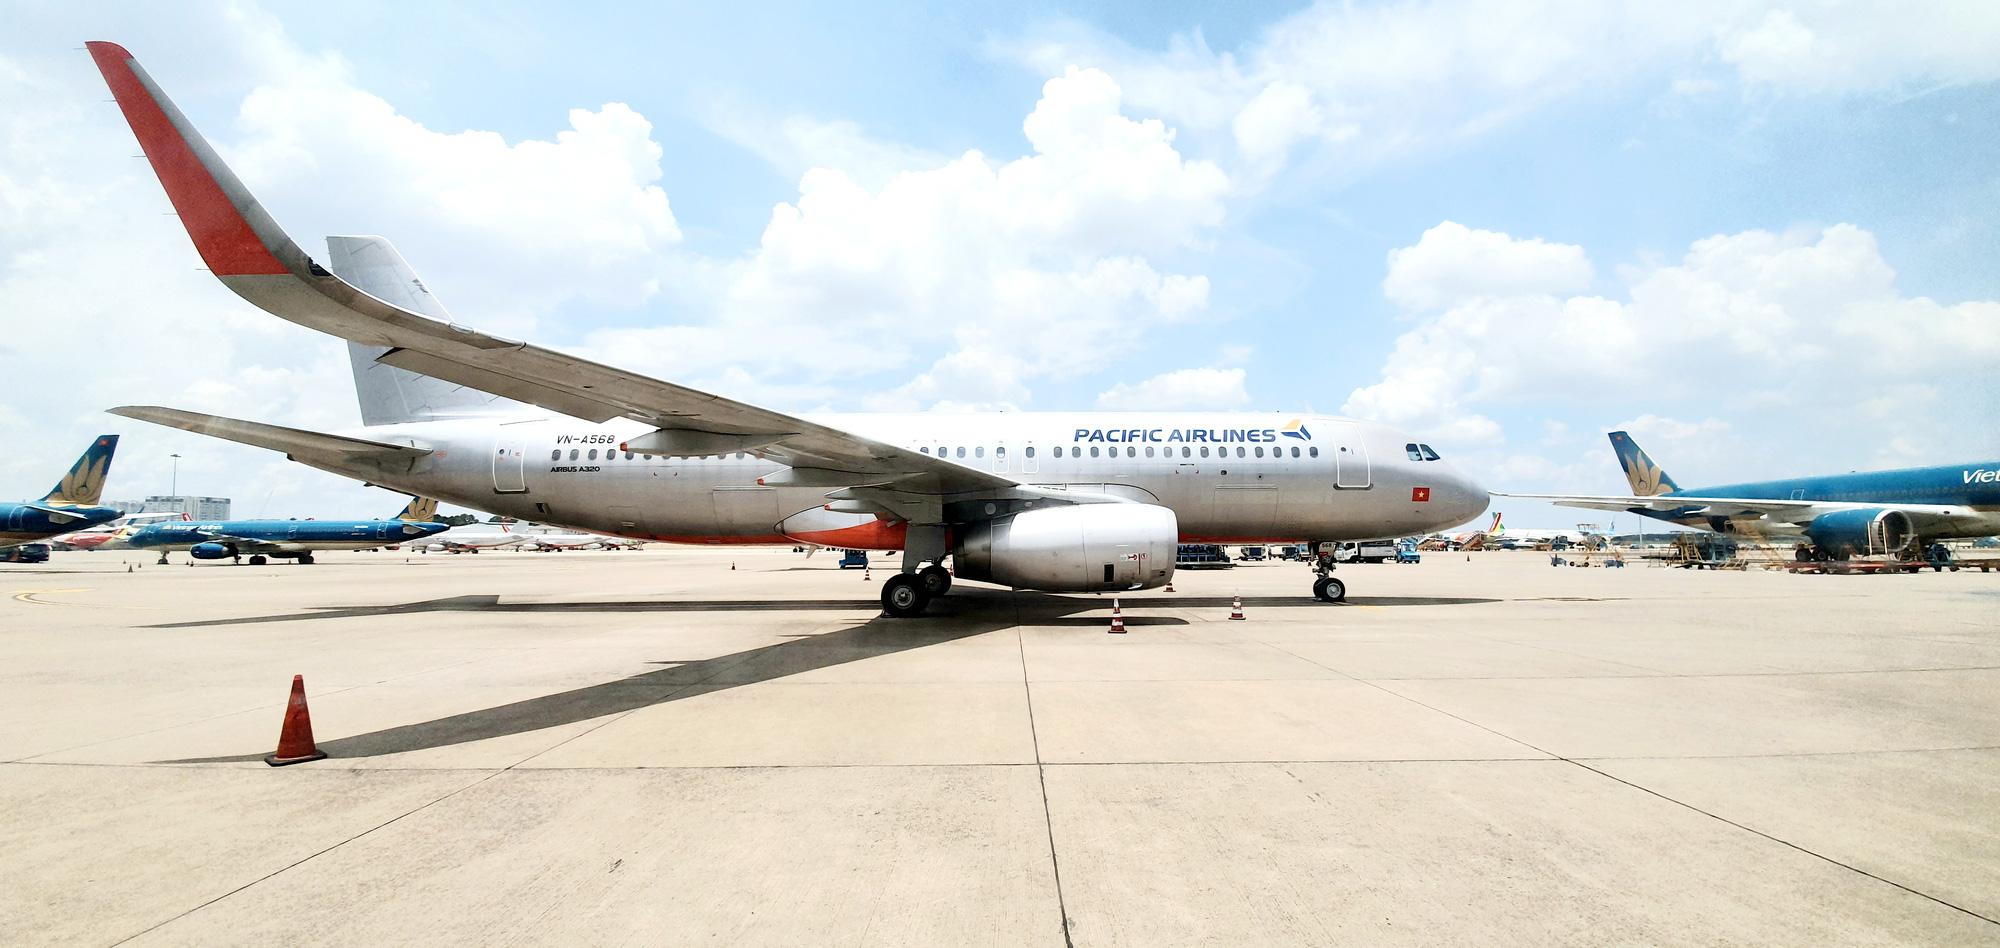 Hanoi-Ho Chi Minh City flight delayed after man shouts 'bomb' on plane